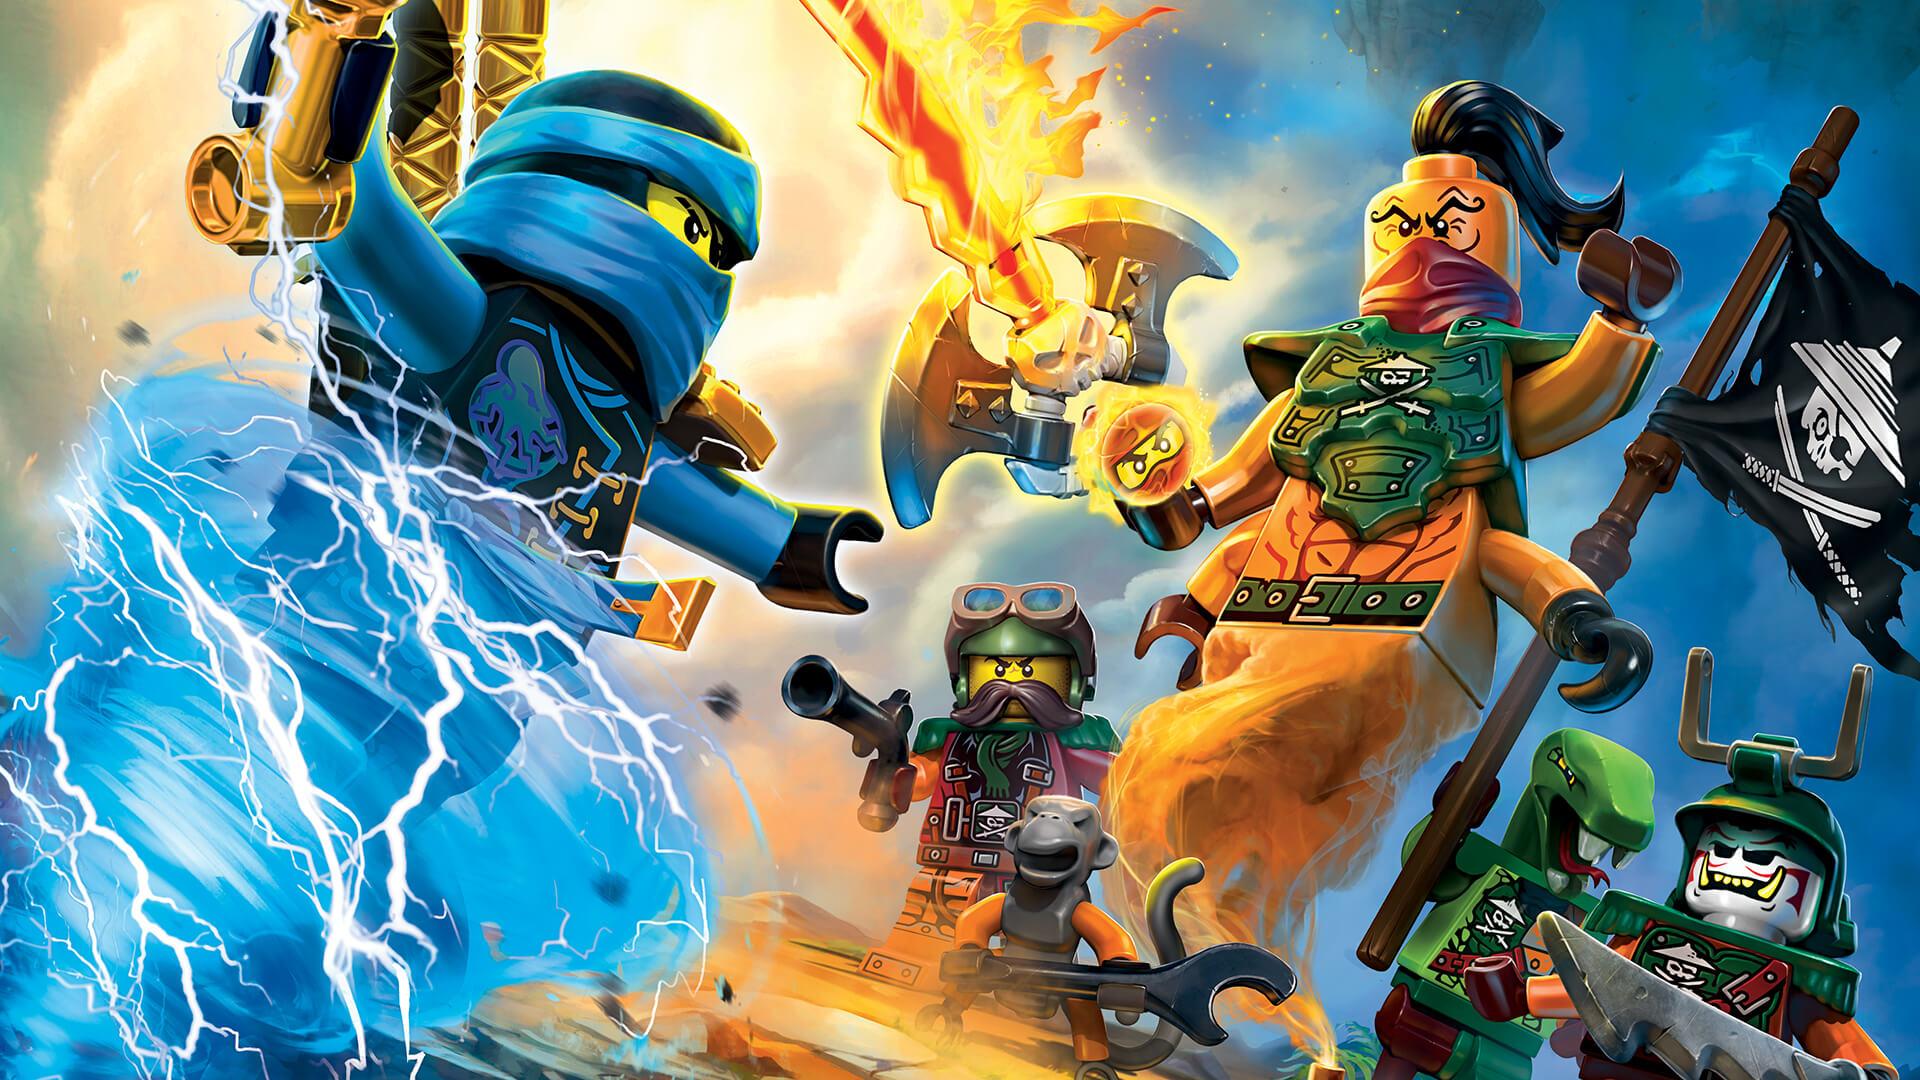 Lego Ninjago: Masters of Spinjitzu | Movie fanart | fanart.tv